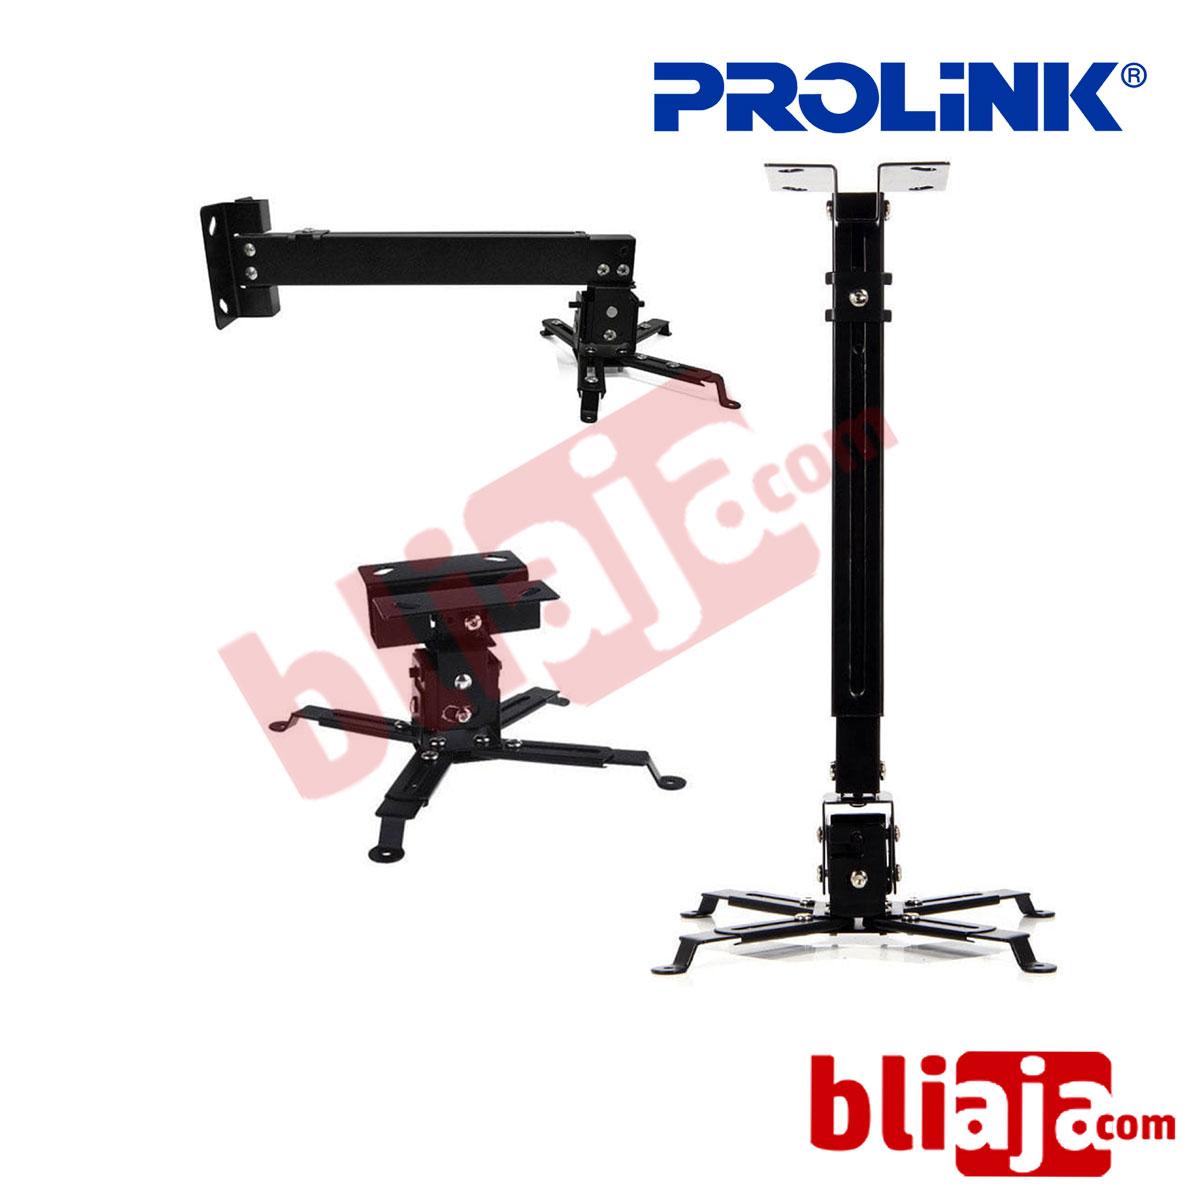 PROLINK PBK-100 PROJECTOR BRACKET